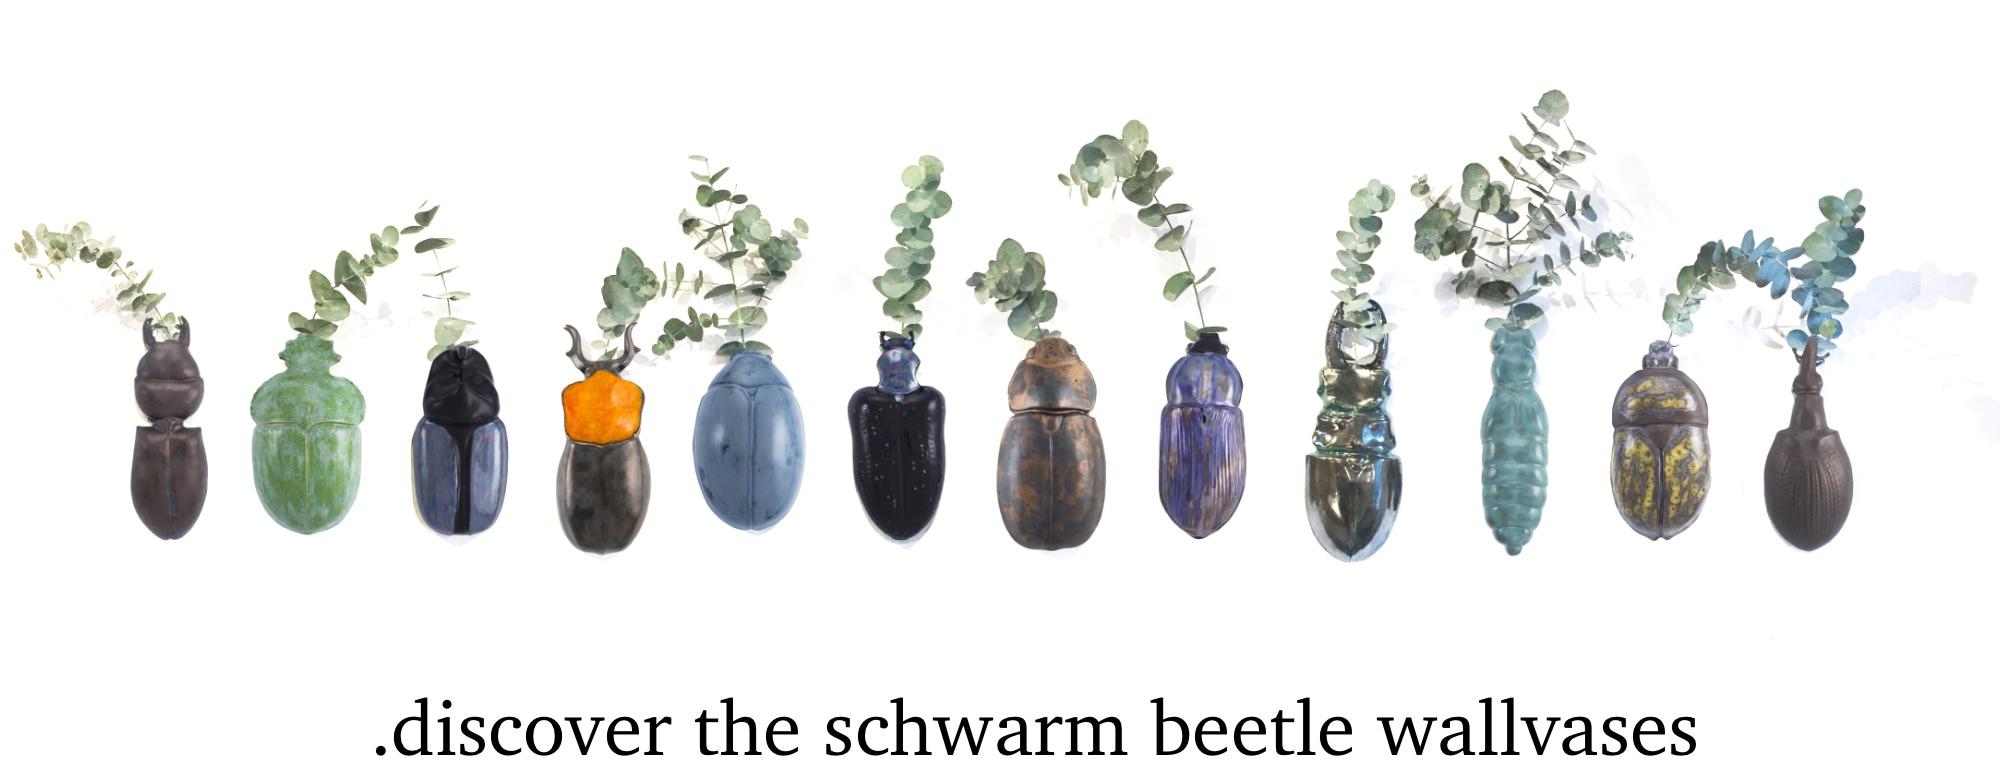 Schwarm beetles wallvases